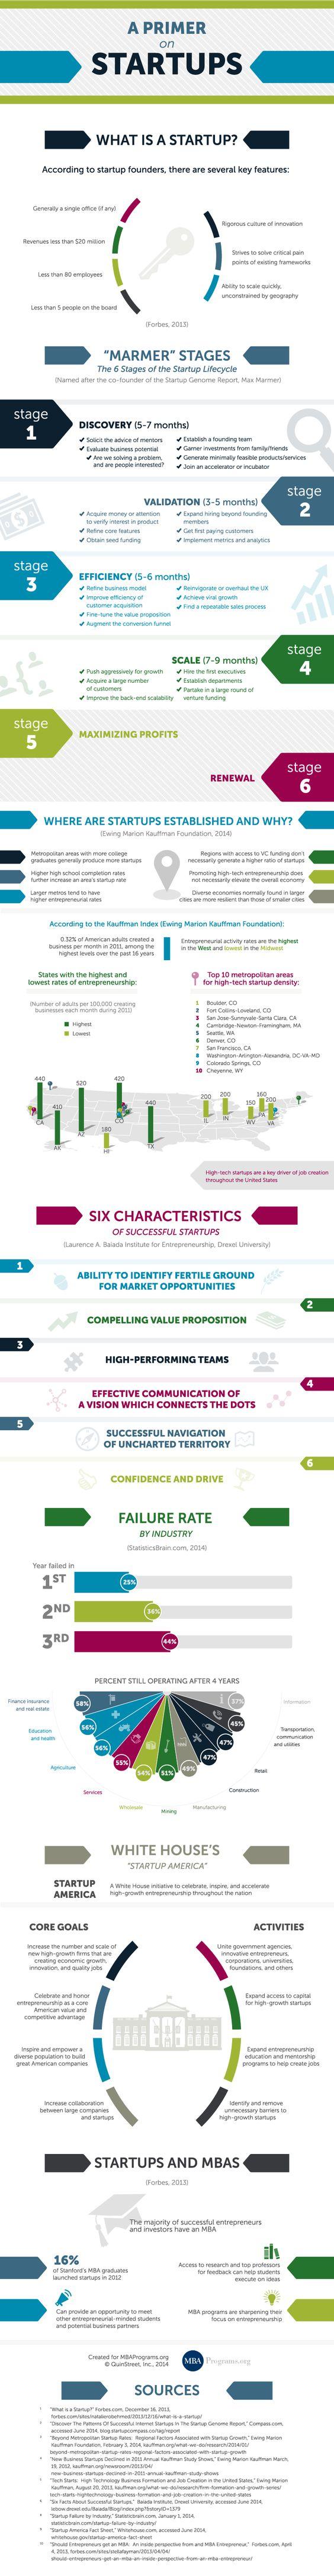 A Primer on Startups    #infographic  #Entrepreneur #Startup #Business